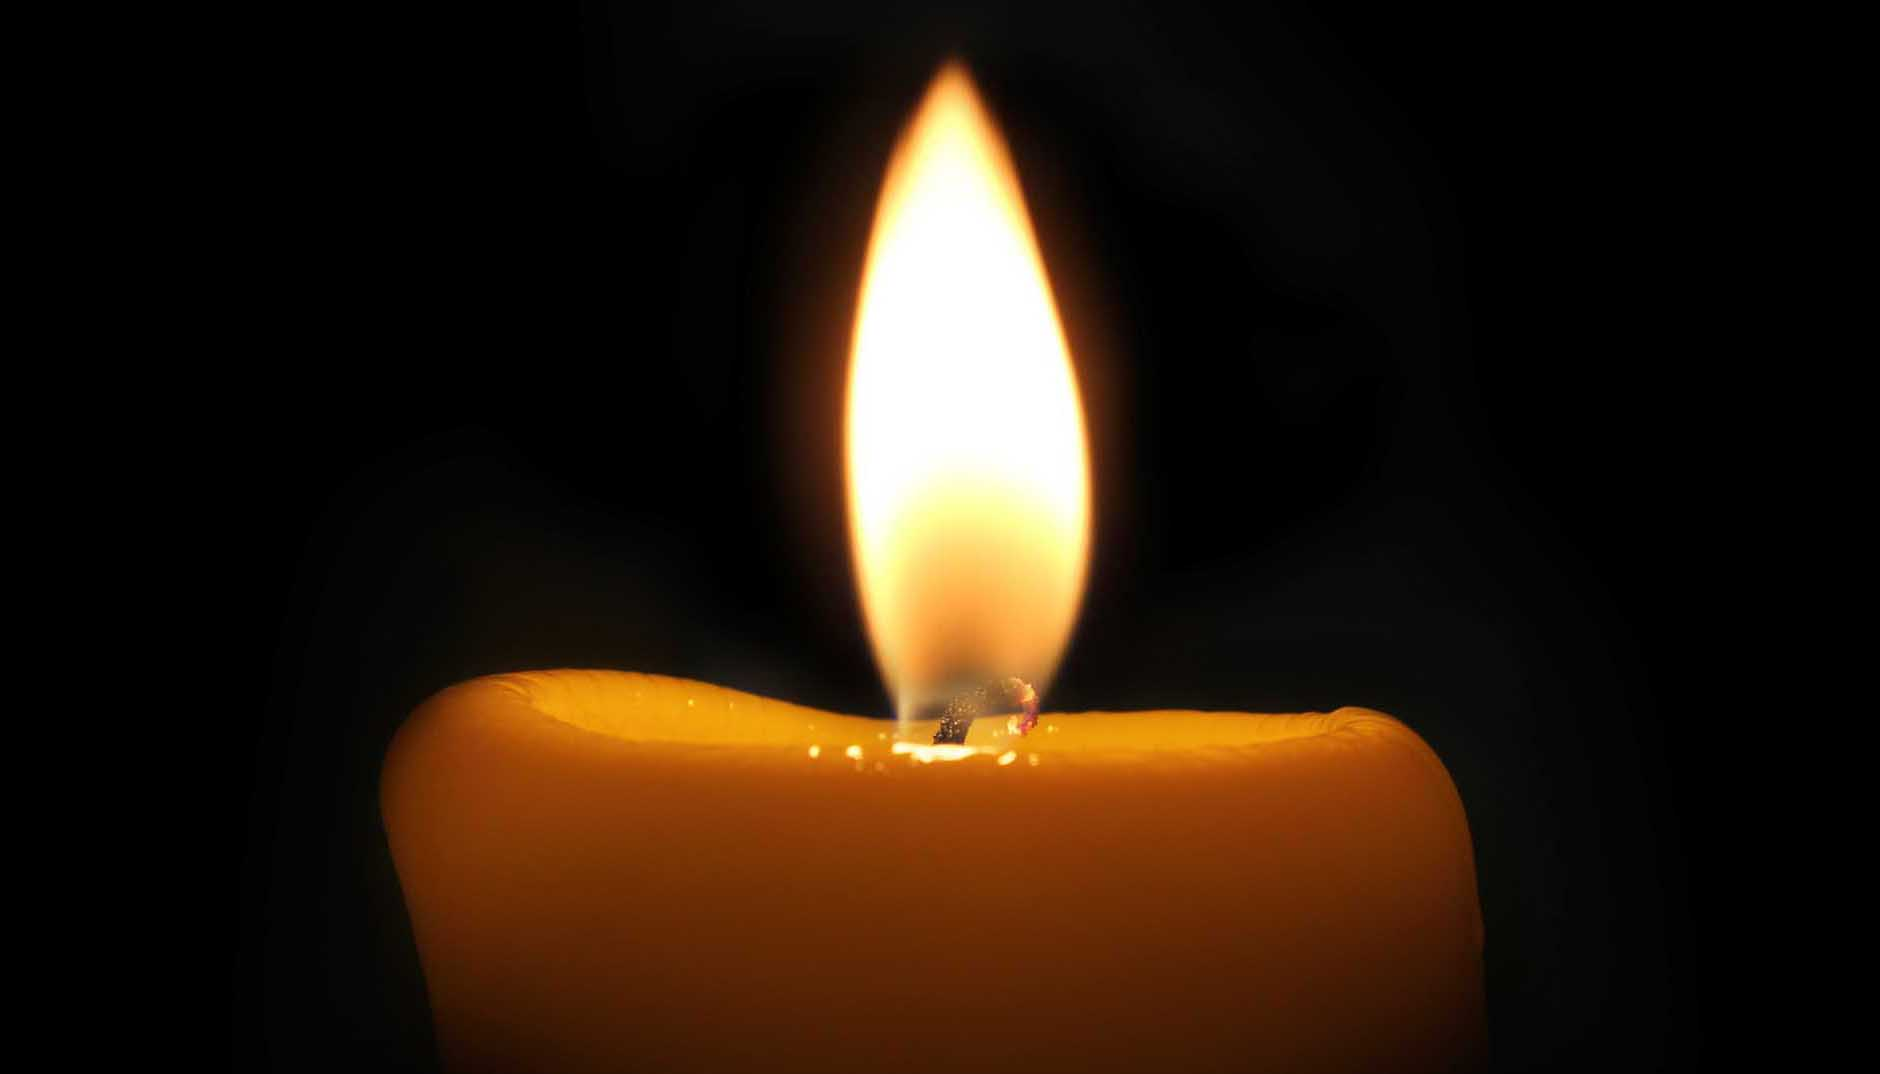 B A P S Star Natalie Desselle Reid Dies At 53